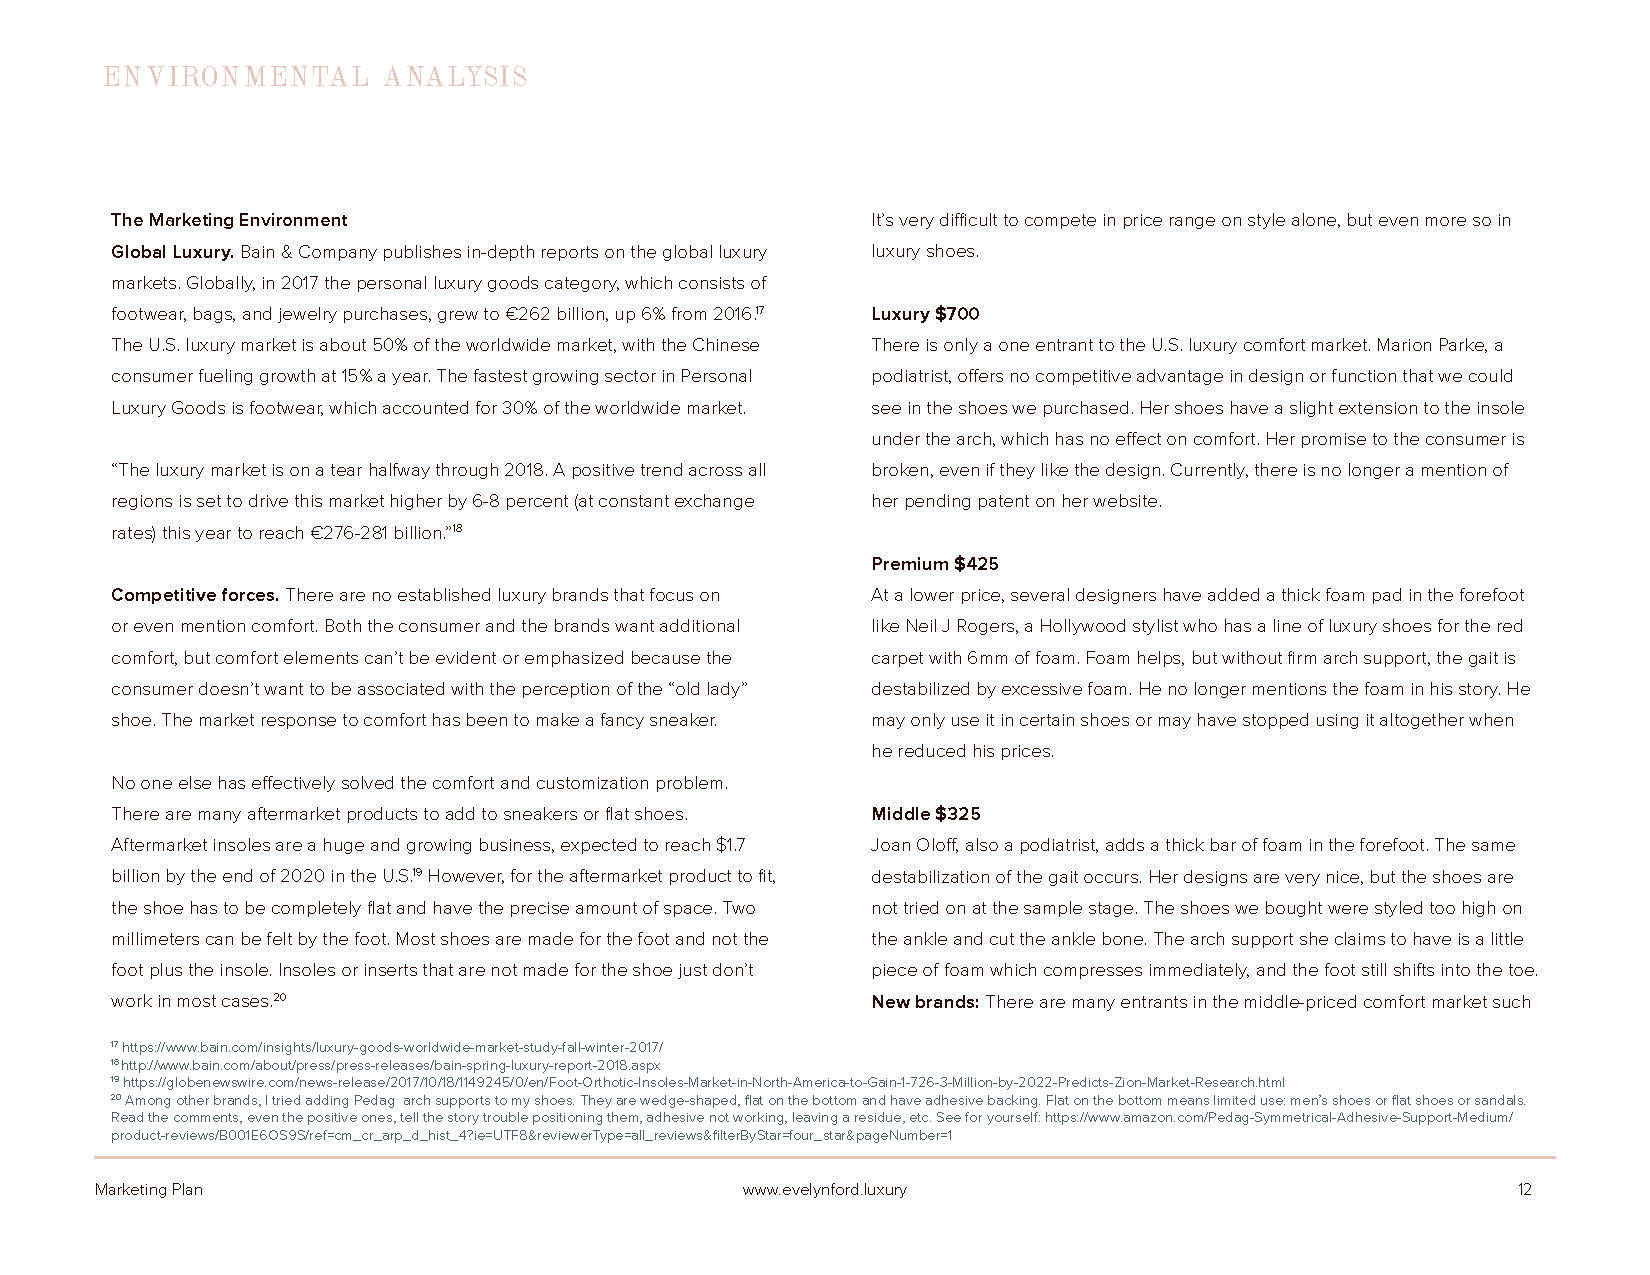 EFL_Marketing_Plan_110118_Page_12.jpg